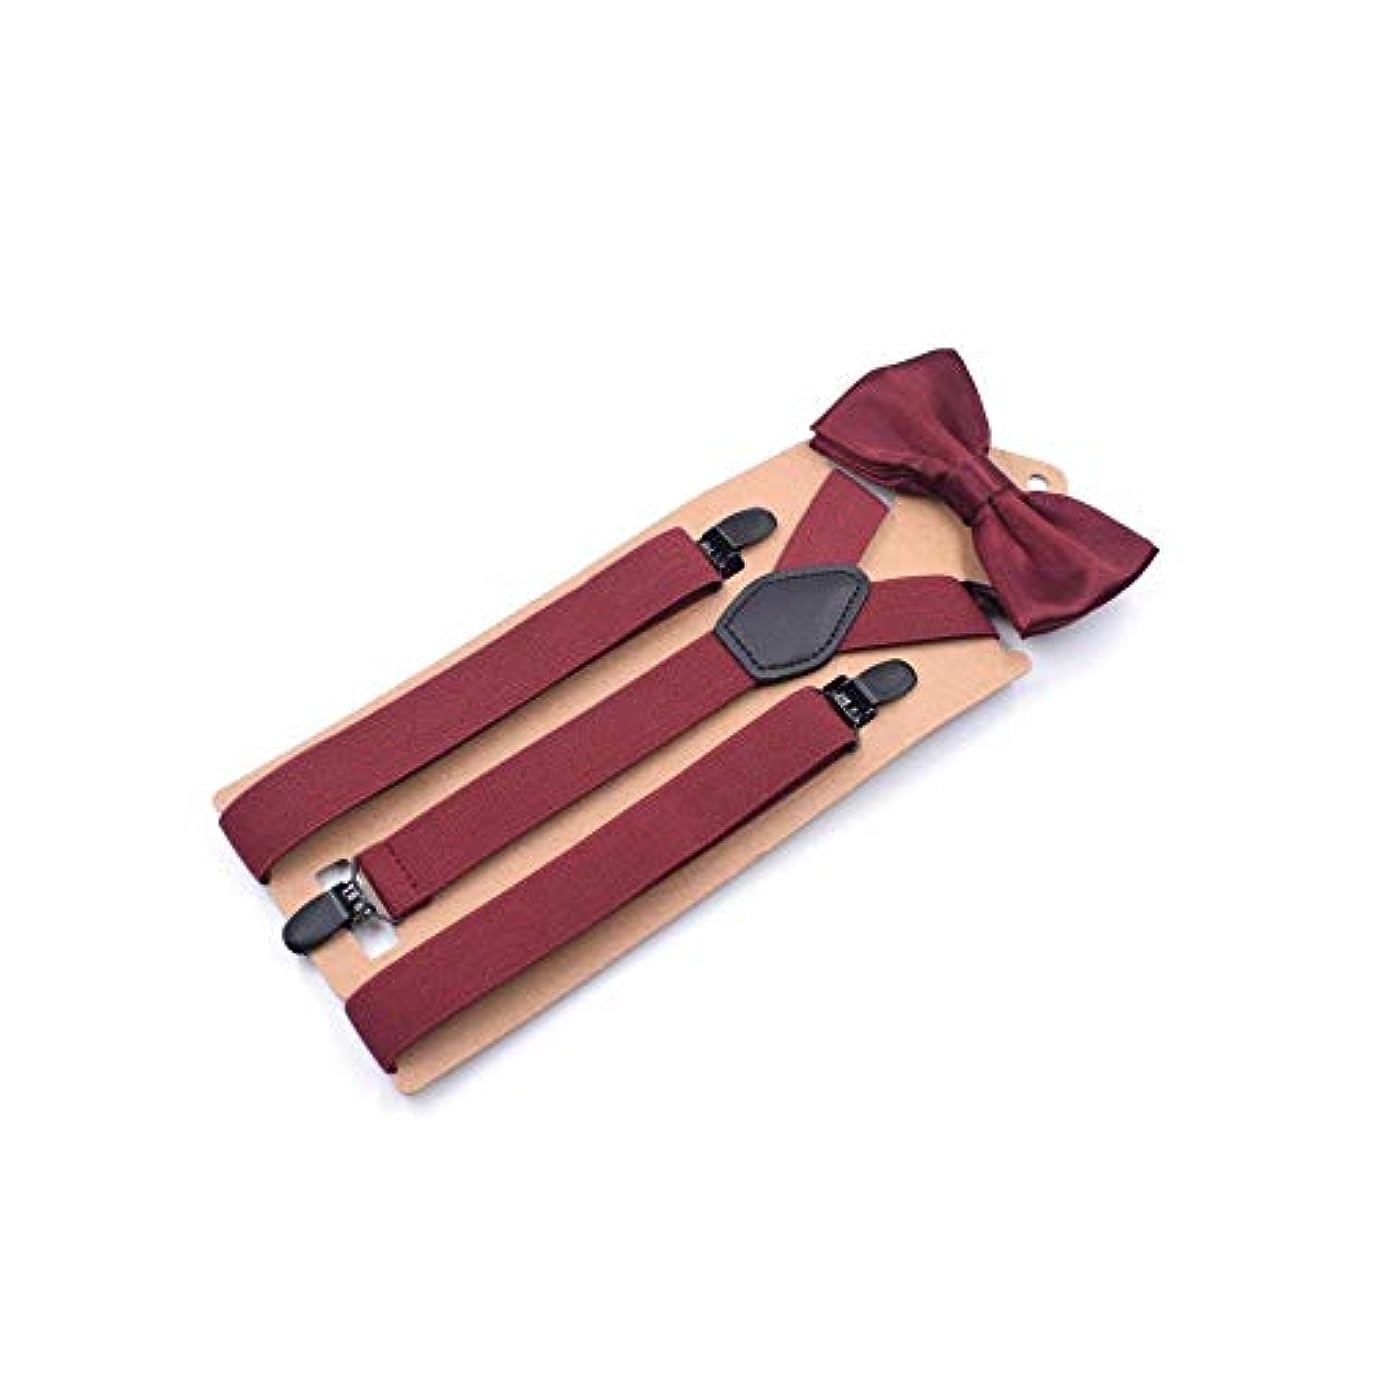 Y字型 大人3クリップY字型サスペンダー蝶ネクタイセット調節可能なブレース弾性ストラップセット ポリエステル+弾性